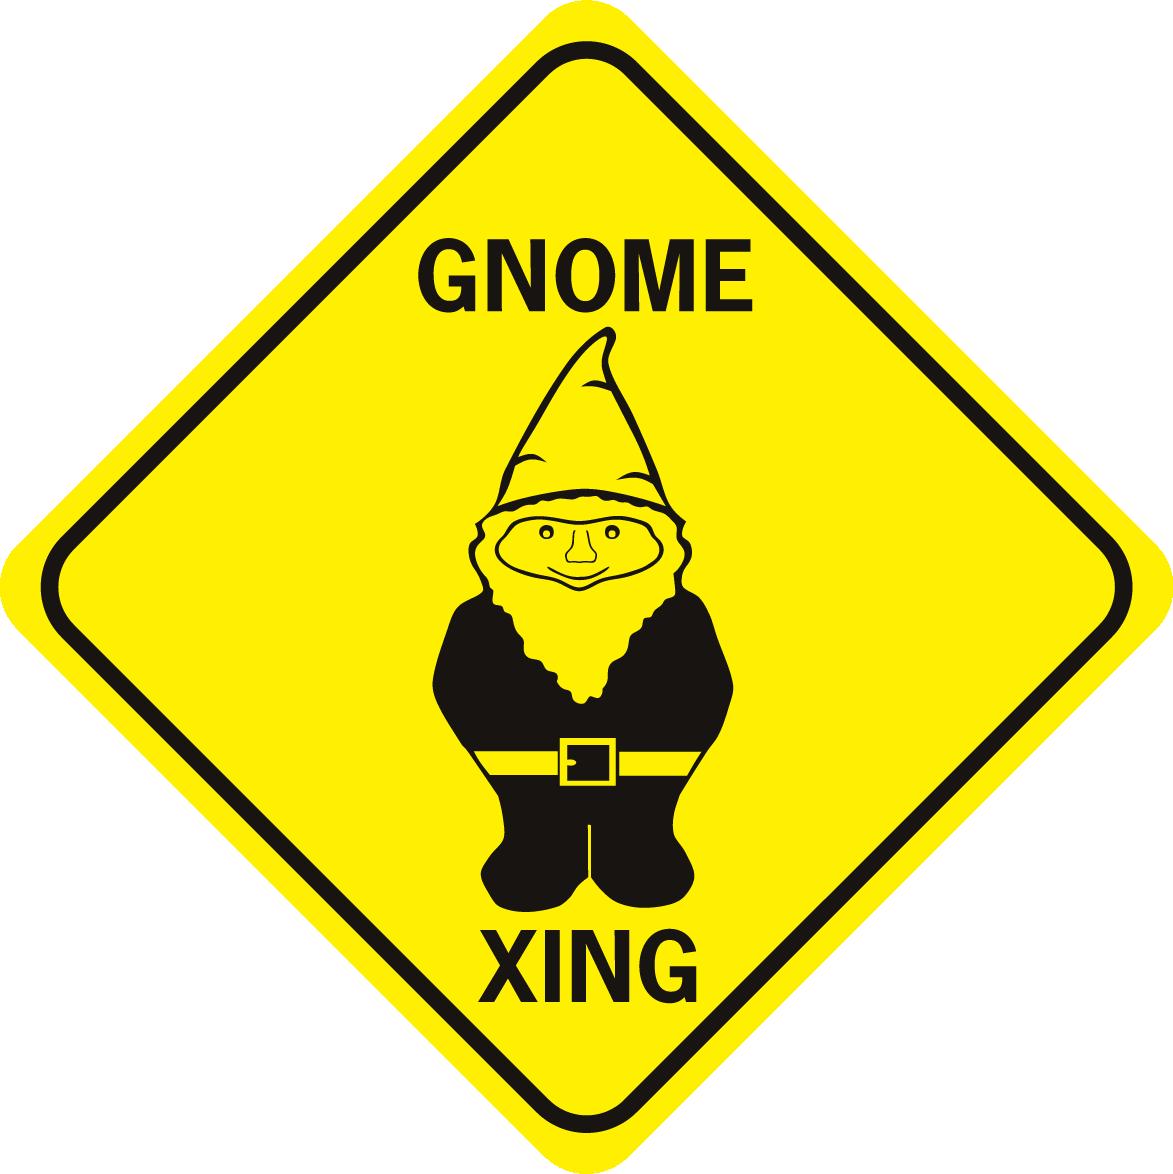 Gnome Xing